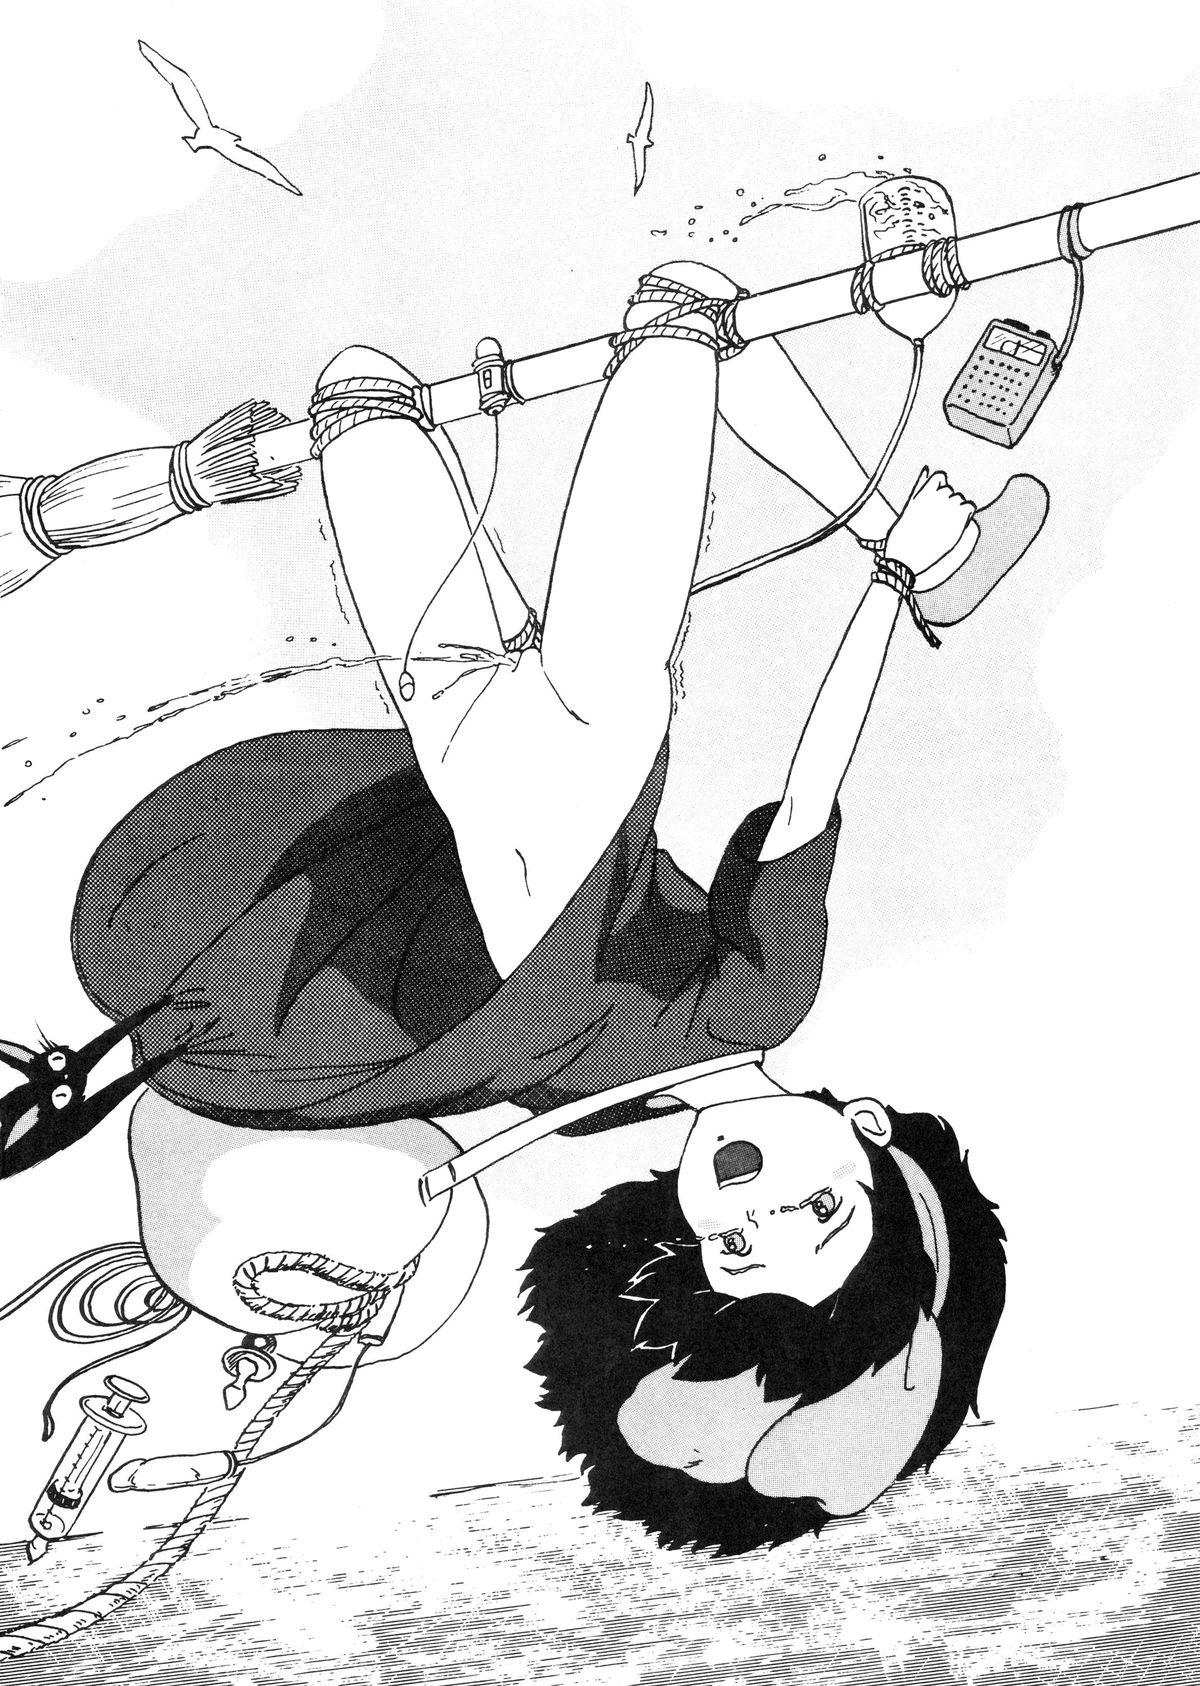 [Secret Society Chi (Iijima Mario)] Kai II - Iijima Mario Kojin-shi - (Various) 16